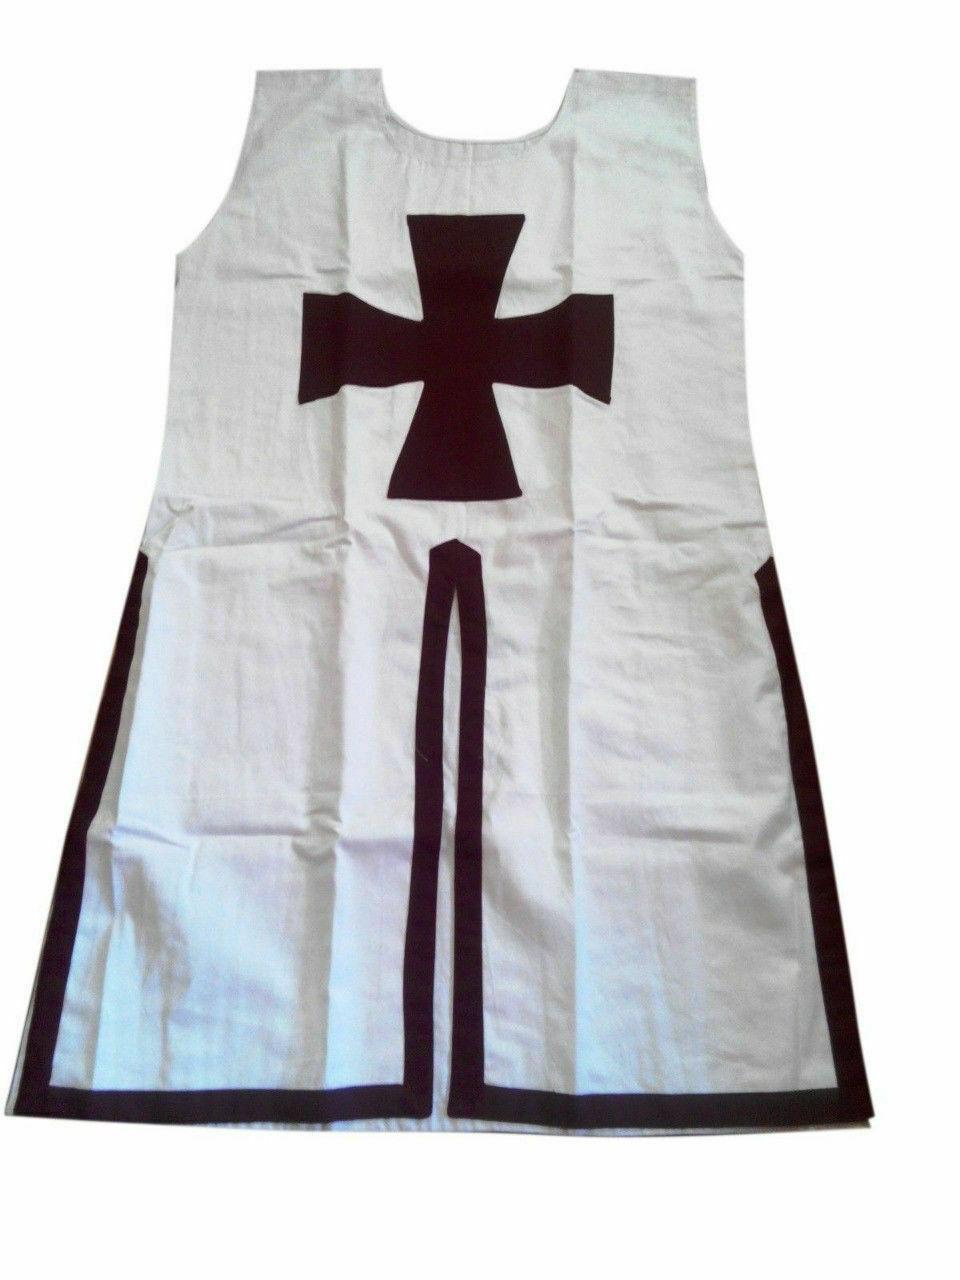 Knights Templar Tunic Tabard Costume Reenactment Medieval Crusader Armou,